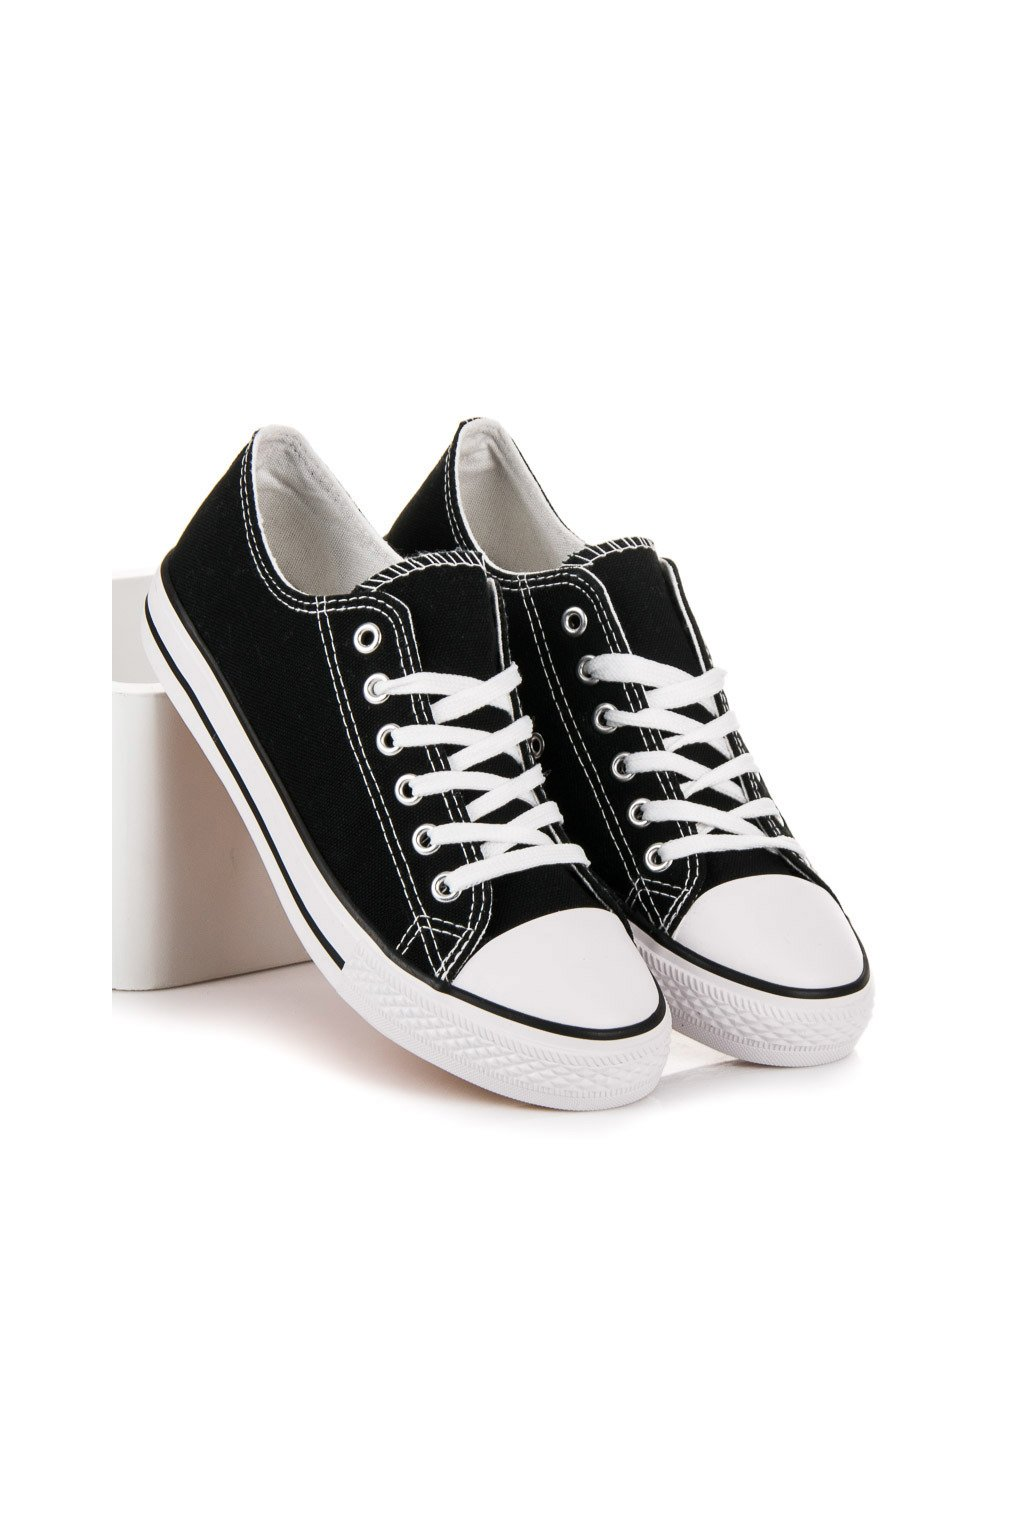 Čierne topánky - Shelovet kod XL03B/W